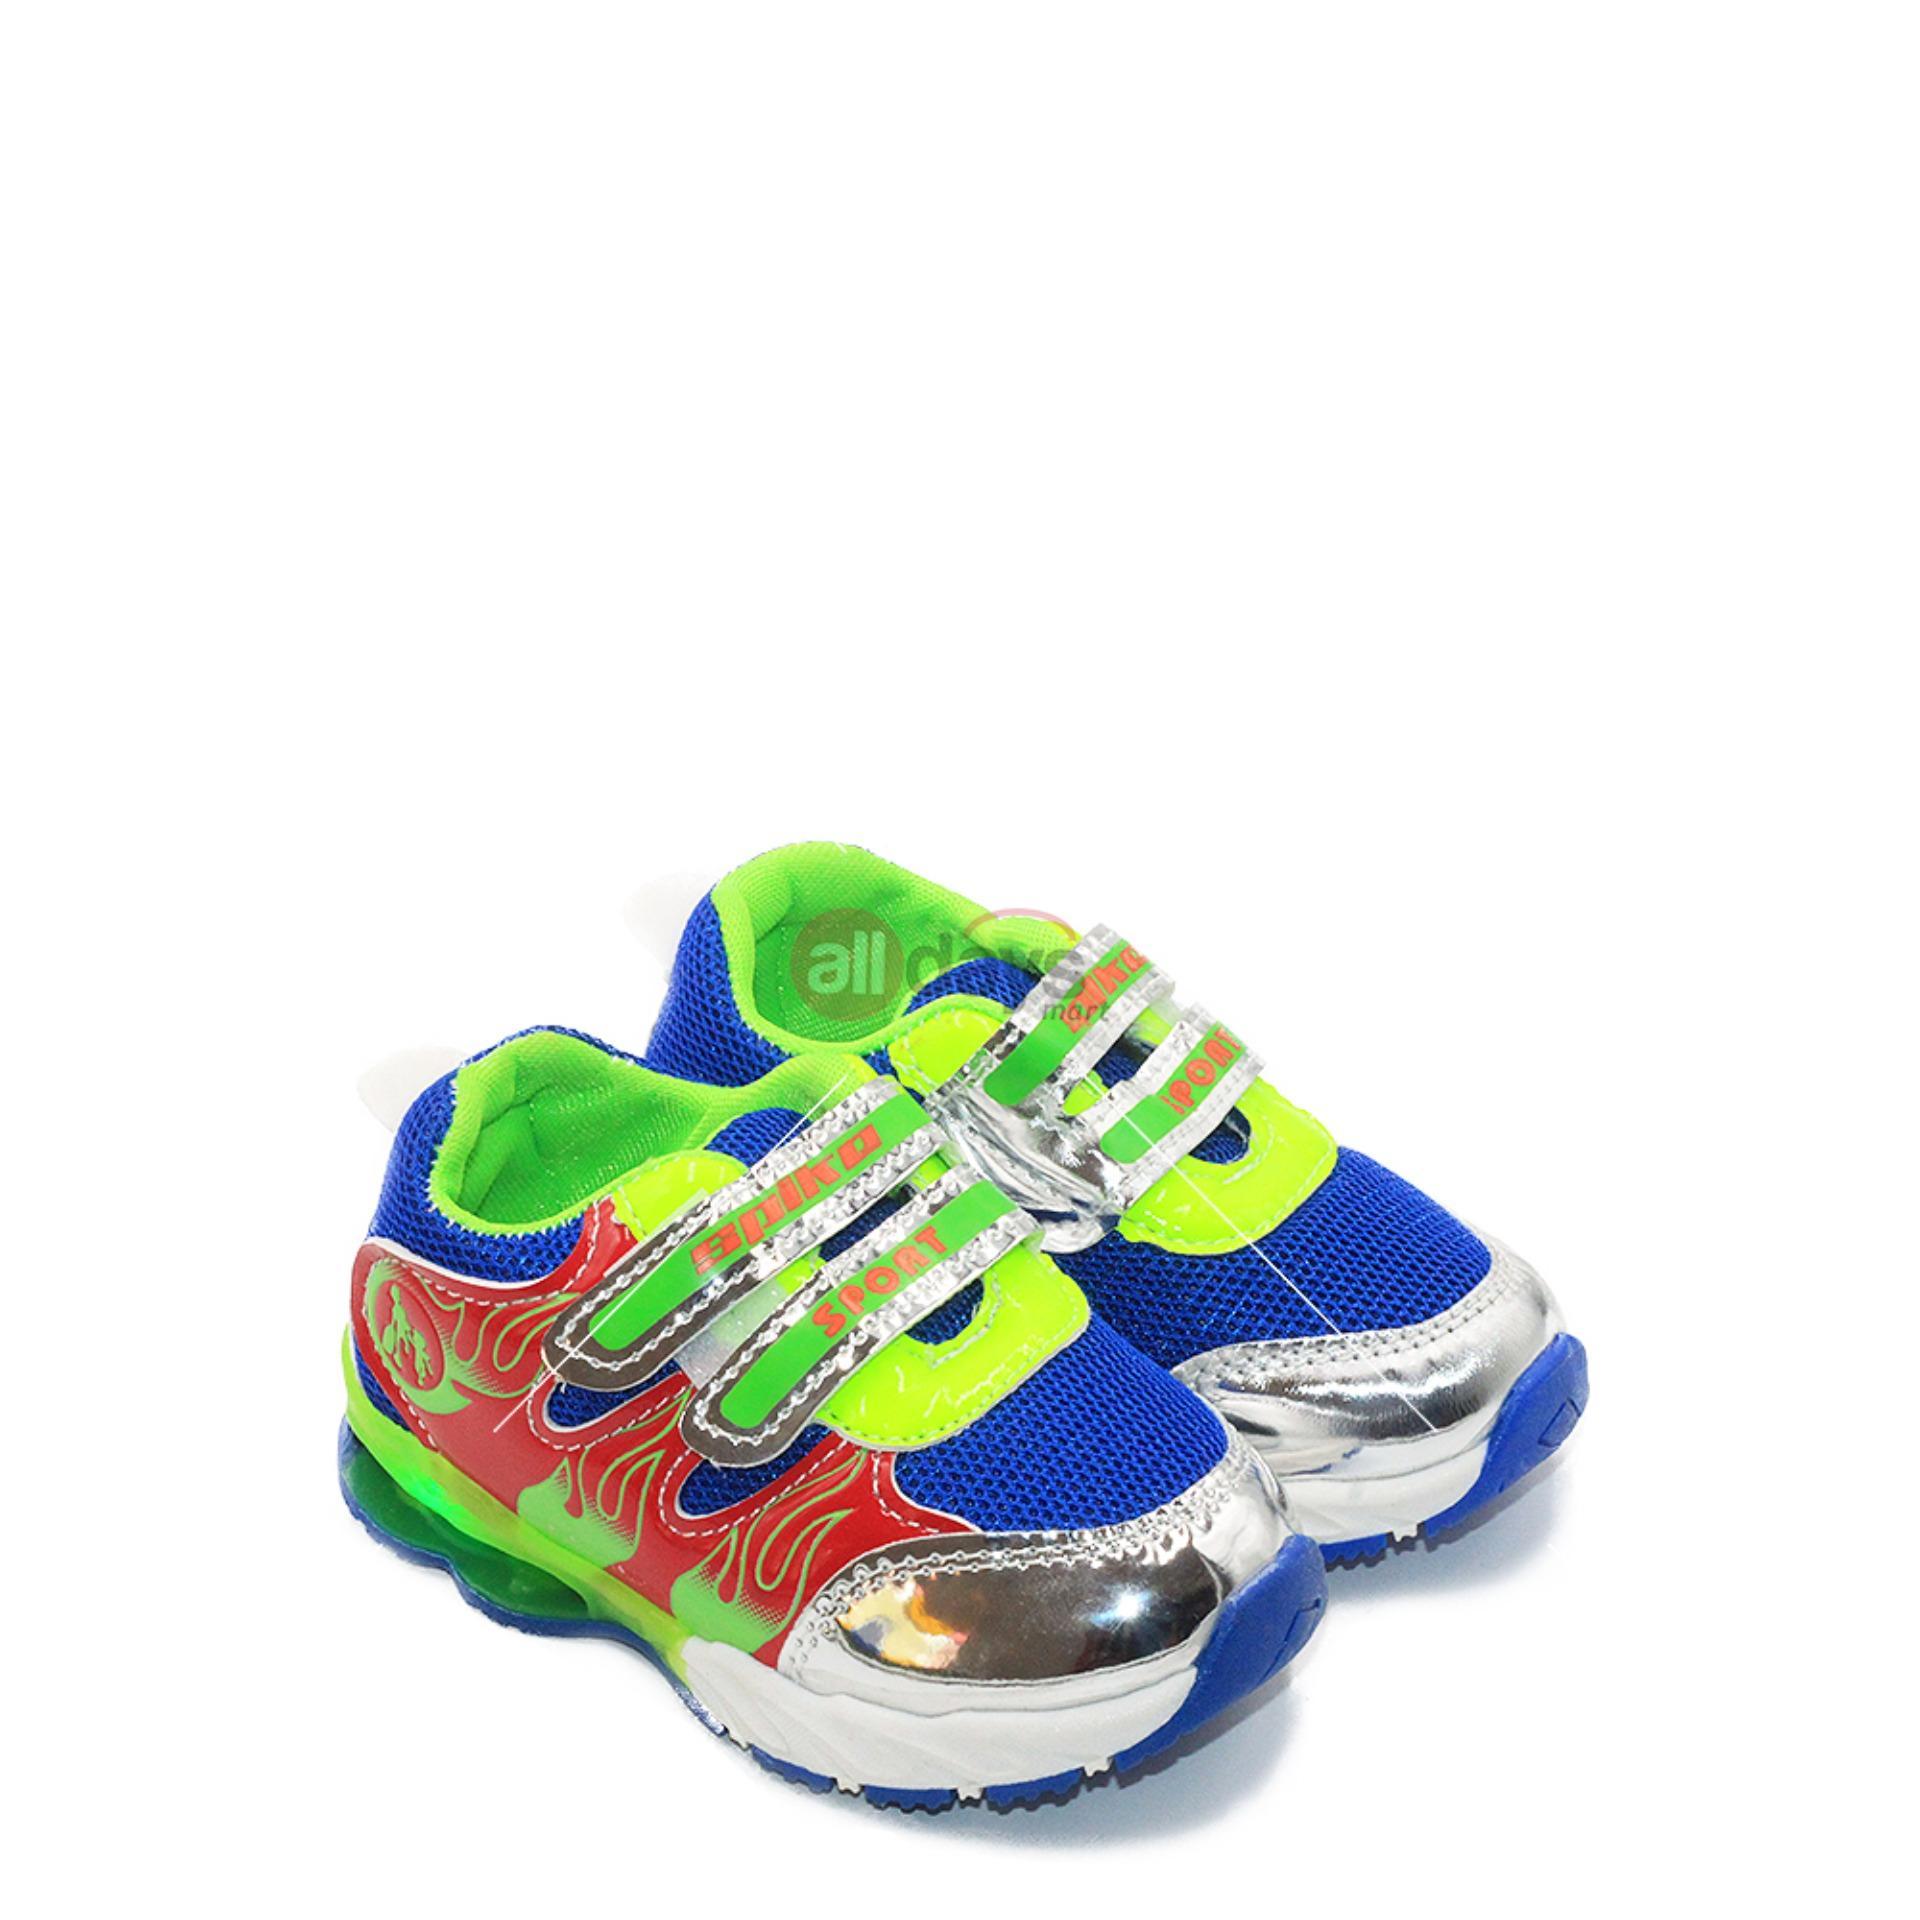 Harga Spike Sepatu Sneakers Anak Laki Laki Led Jkl 5369 Blue Ada Per Di Sol Spike Baru